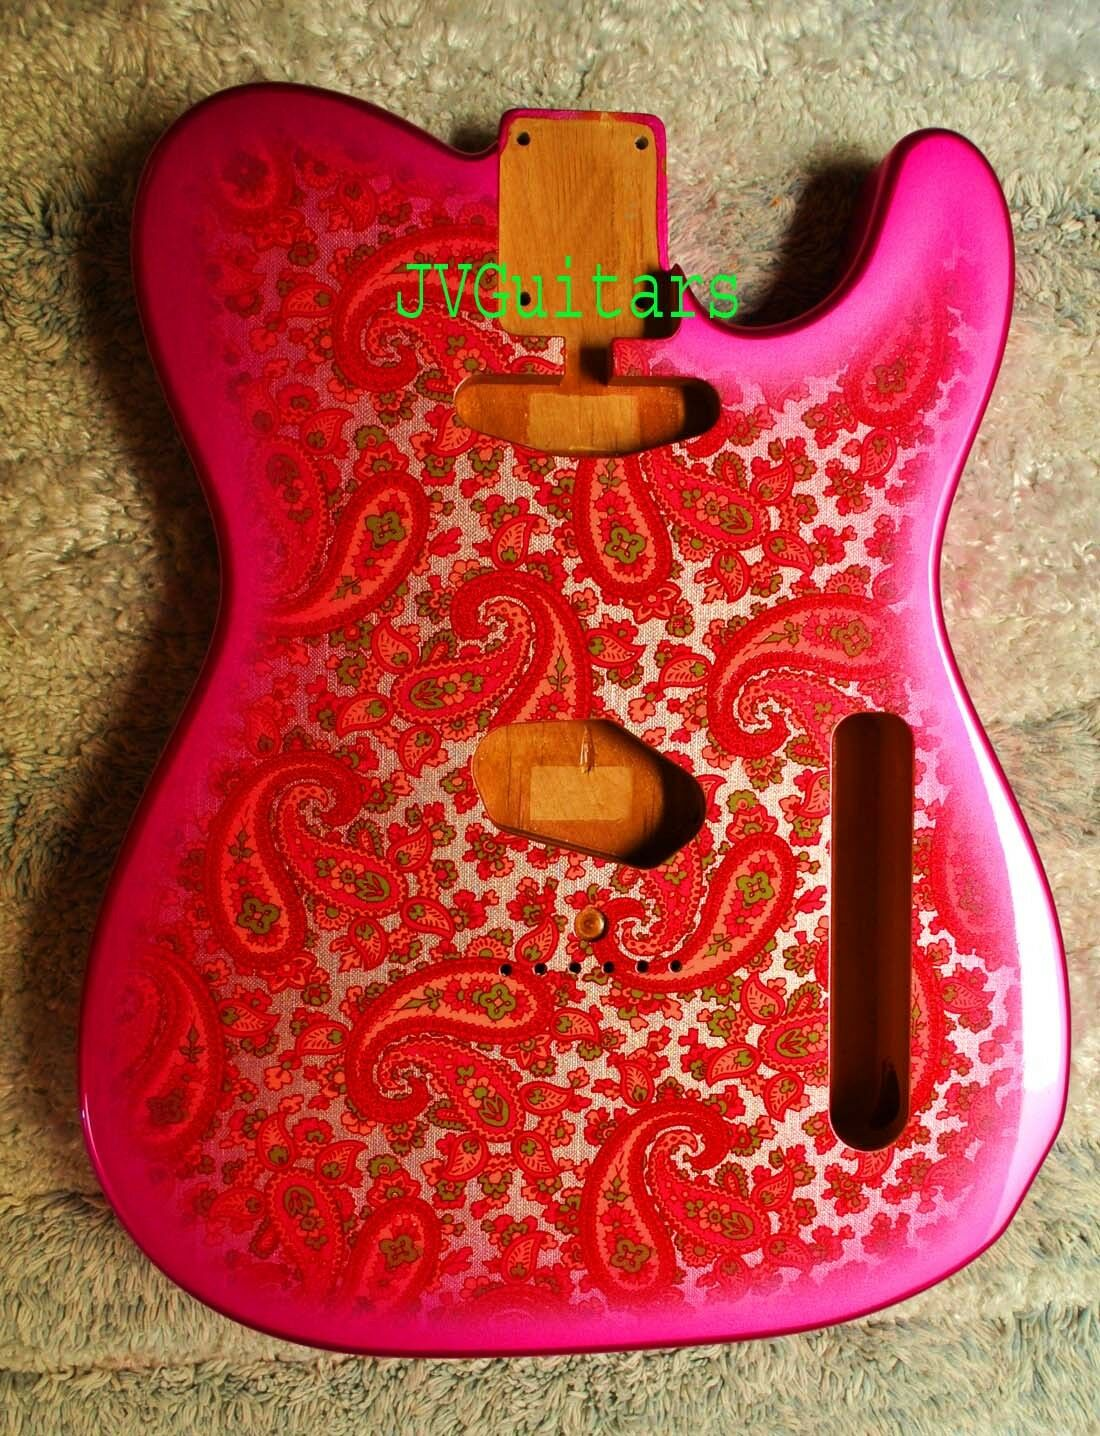 1969 Paisley Tel Clásico Paisley rosado nos nos nos cuerpo orden suya Wow  jvguitars eb4148